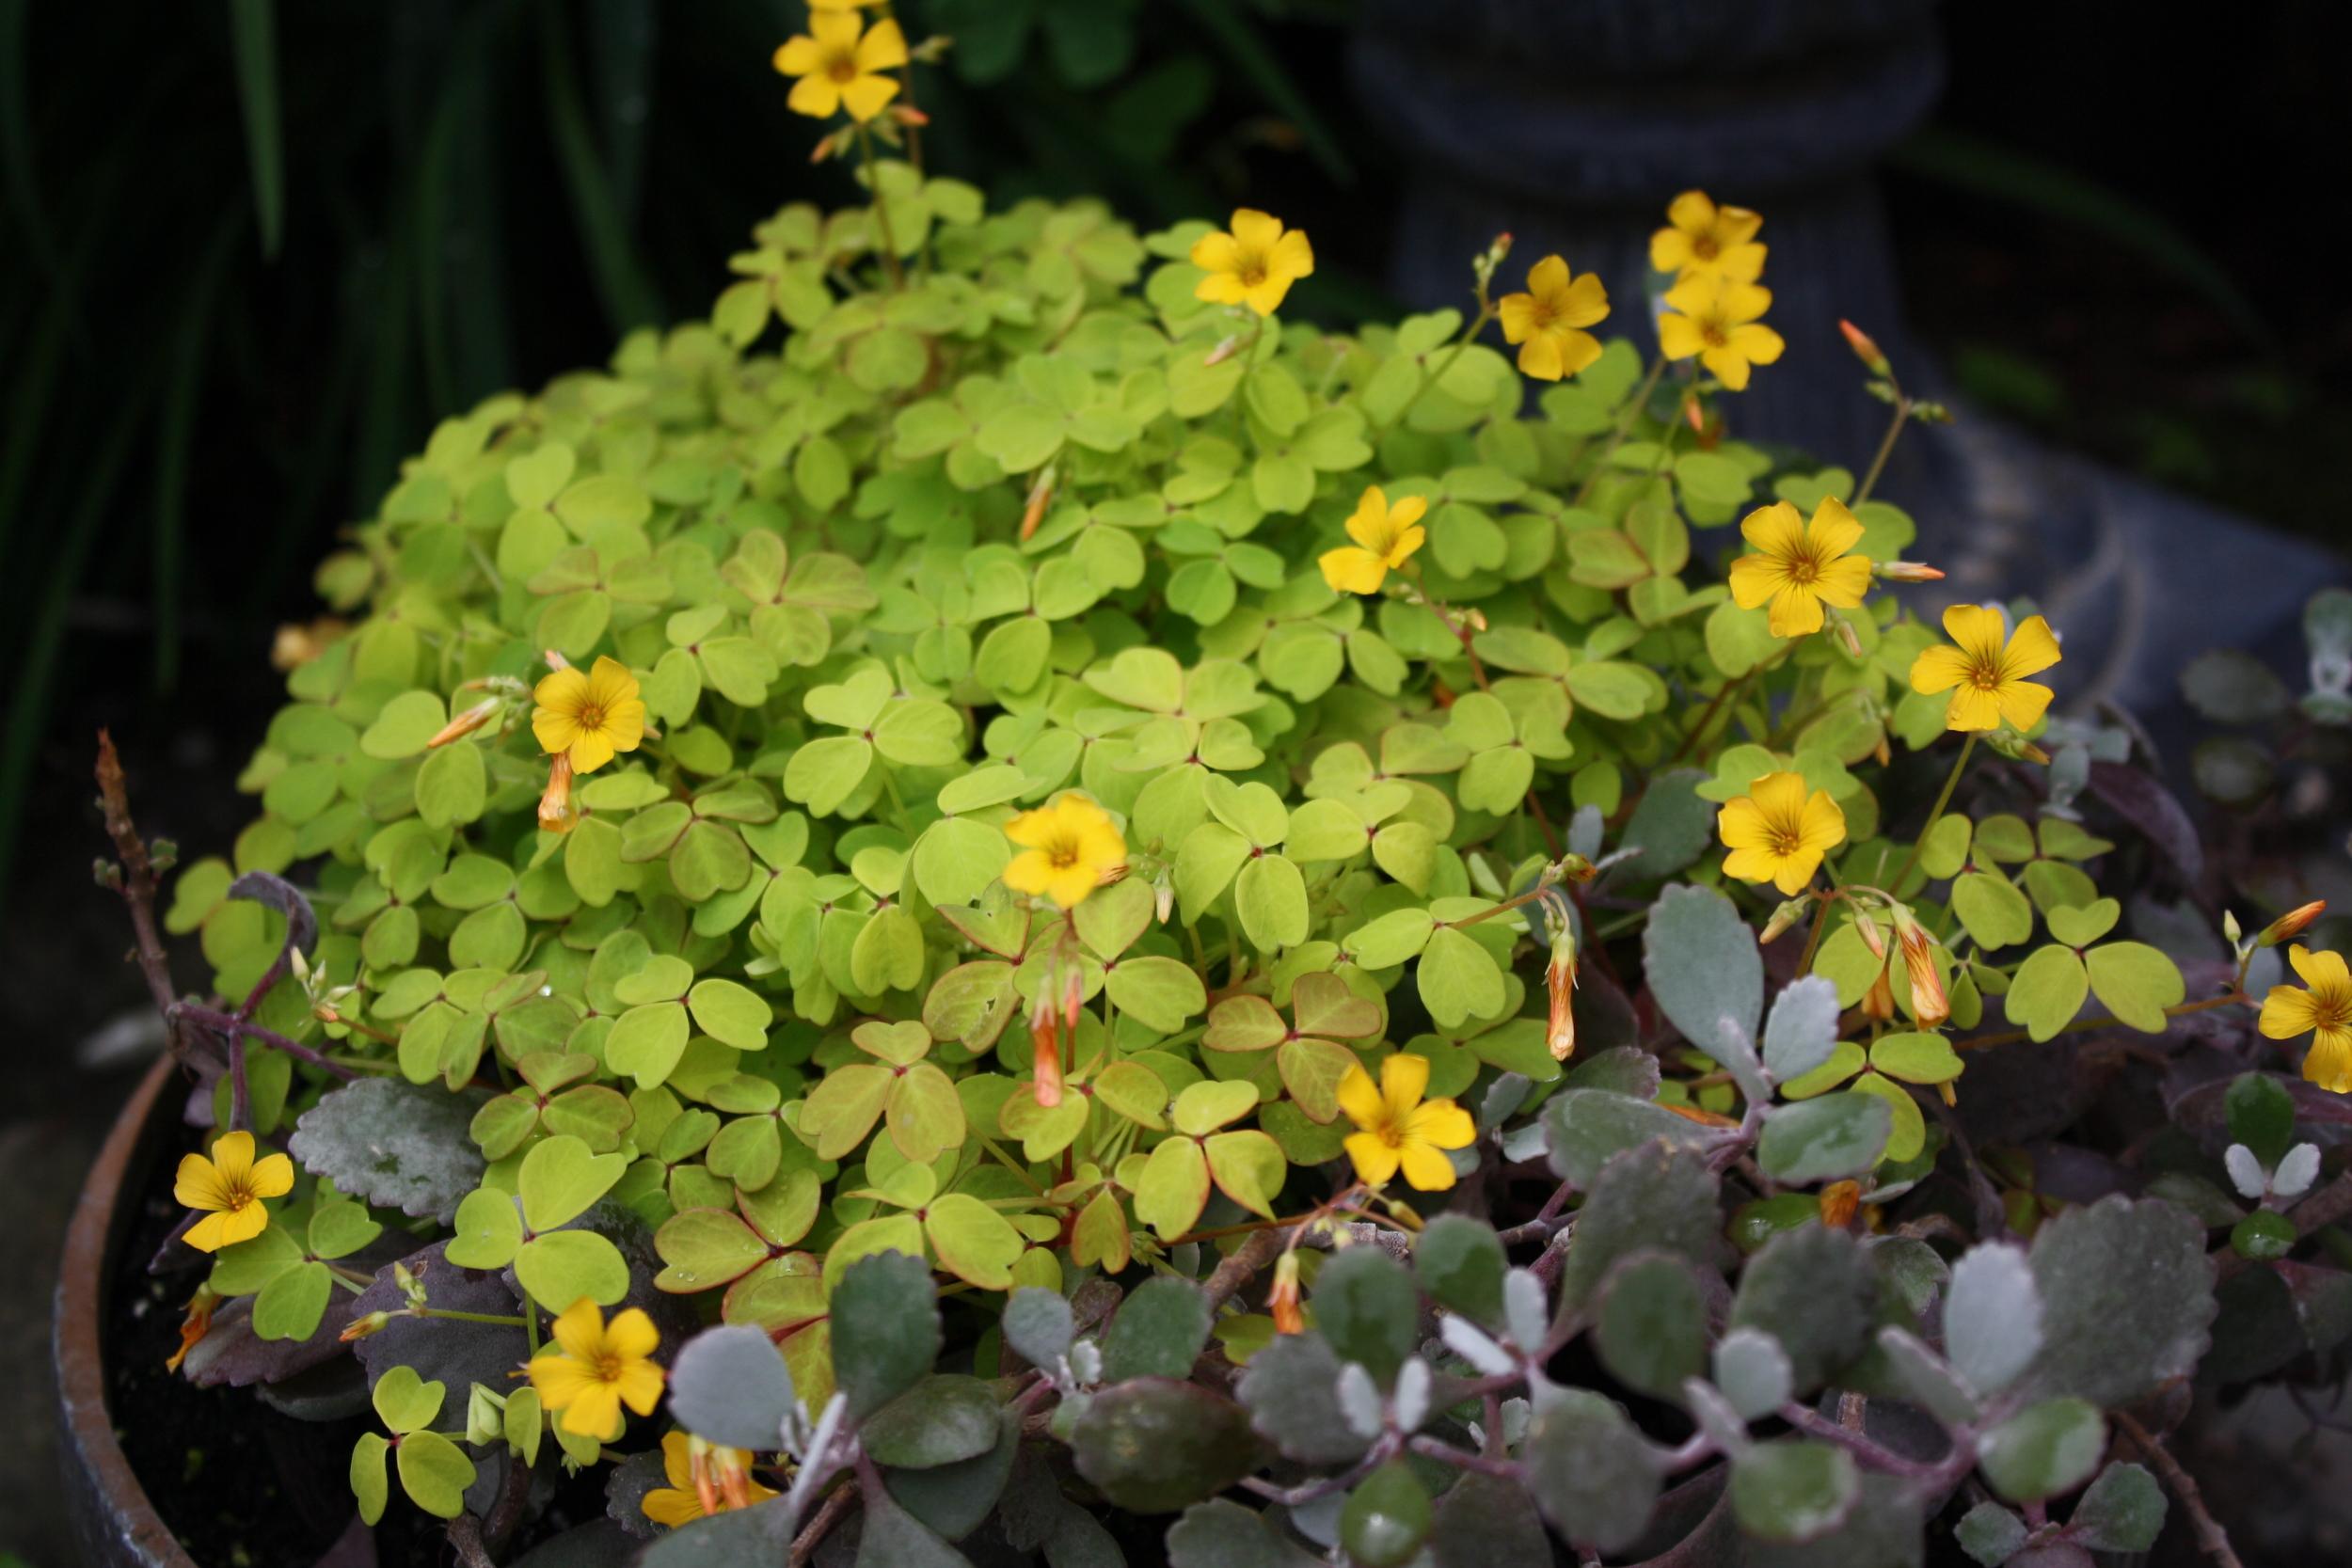 Oxalis 'Molten Lava' blooming